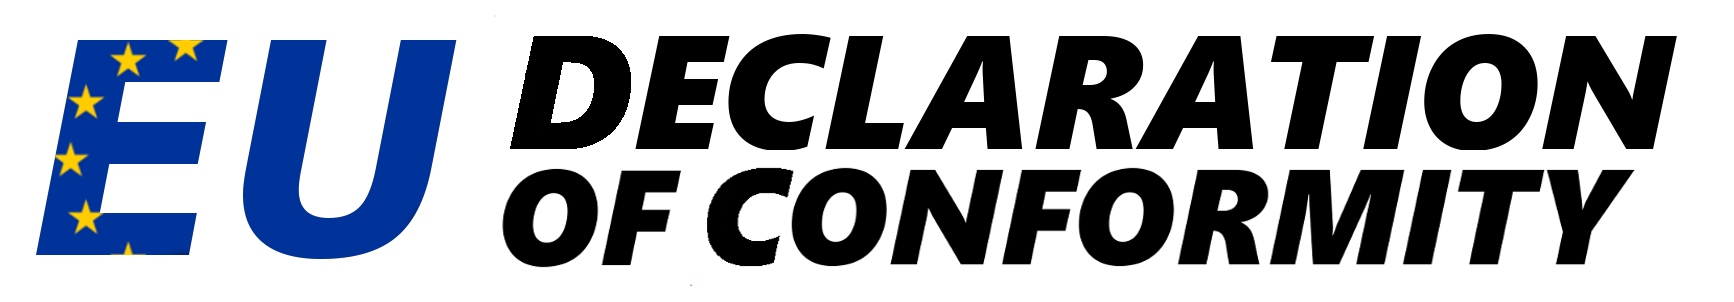 Logo CE-MARKING.help